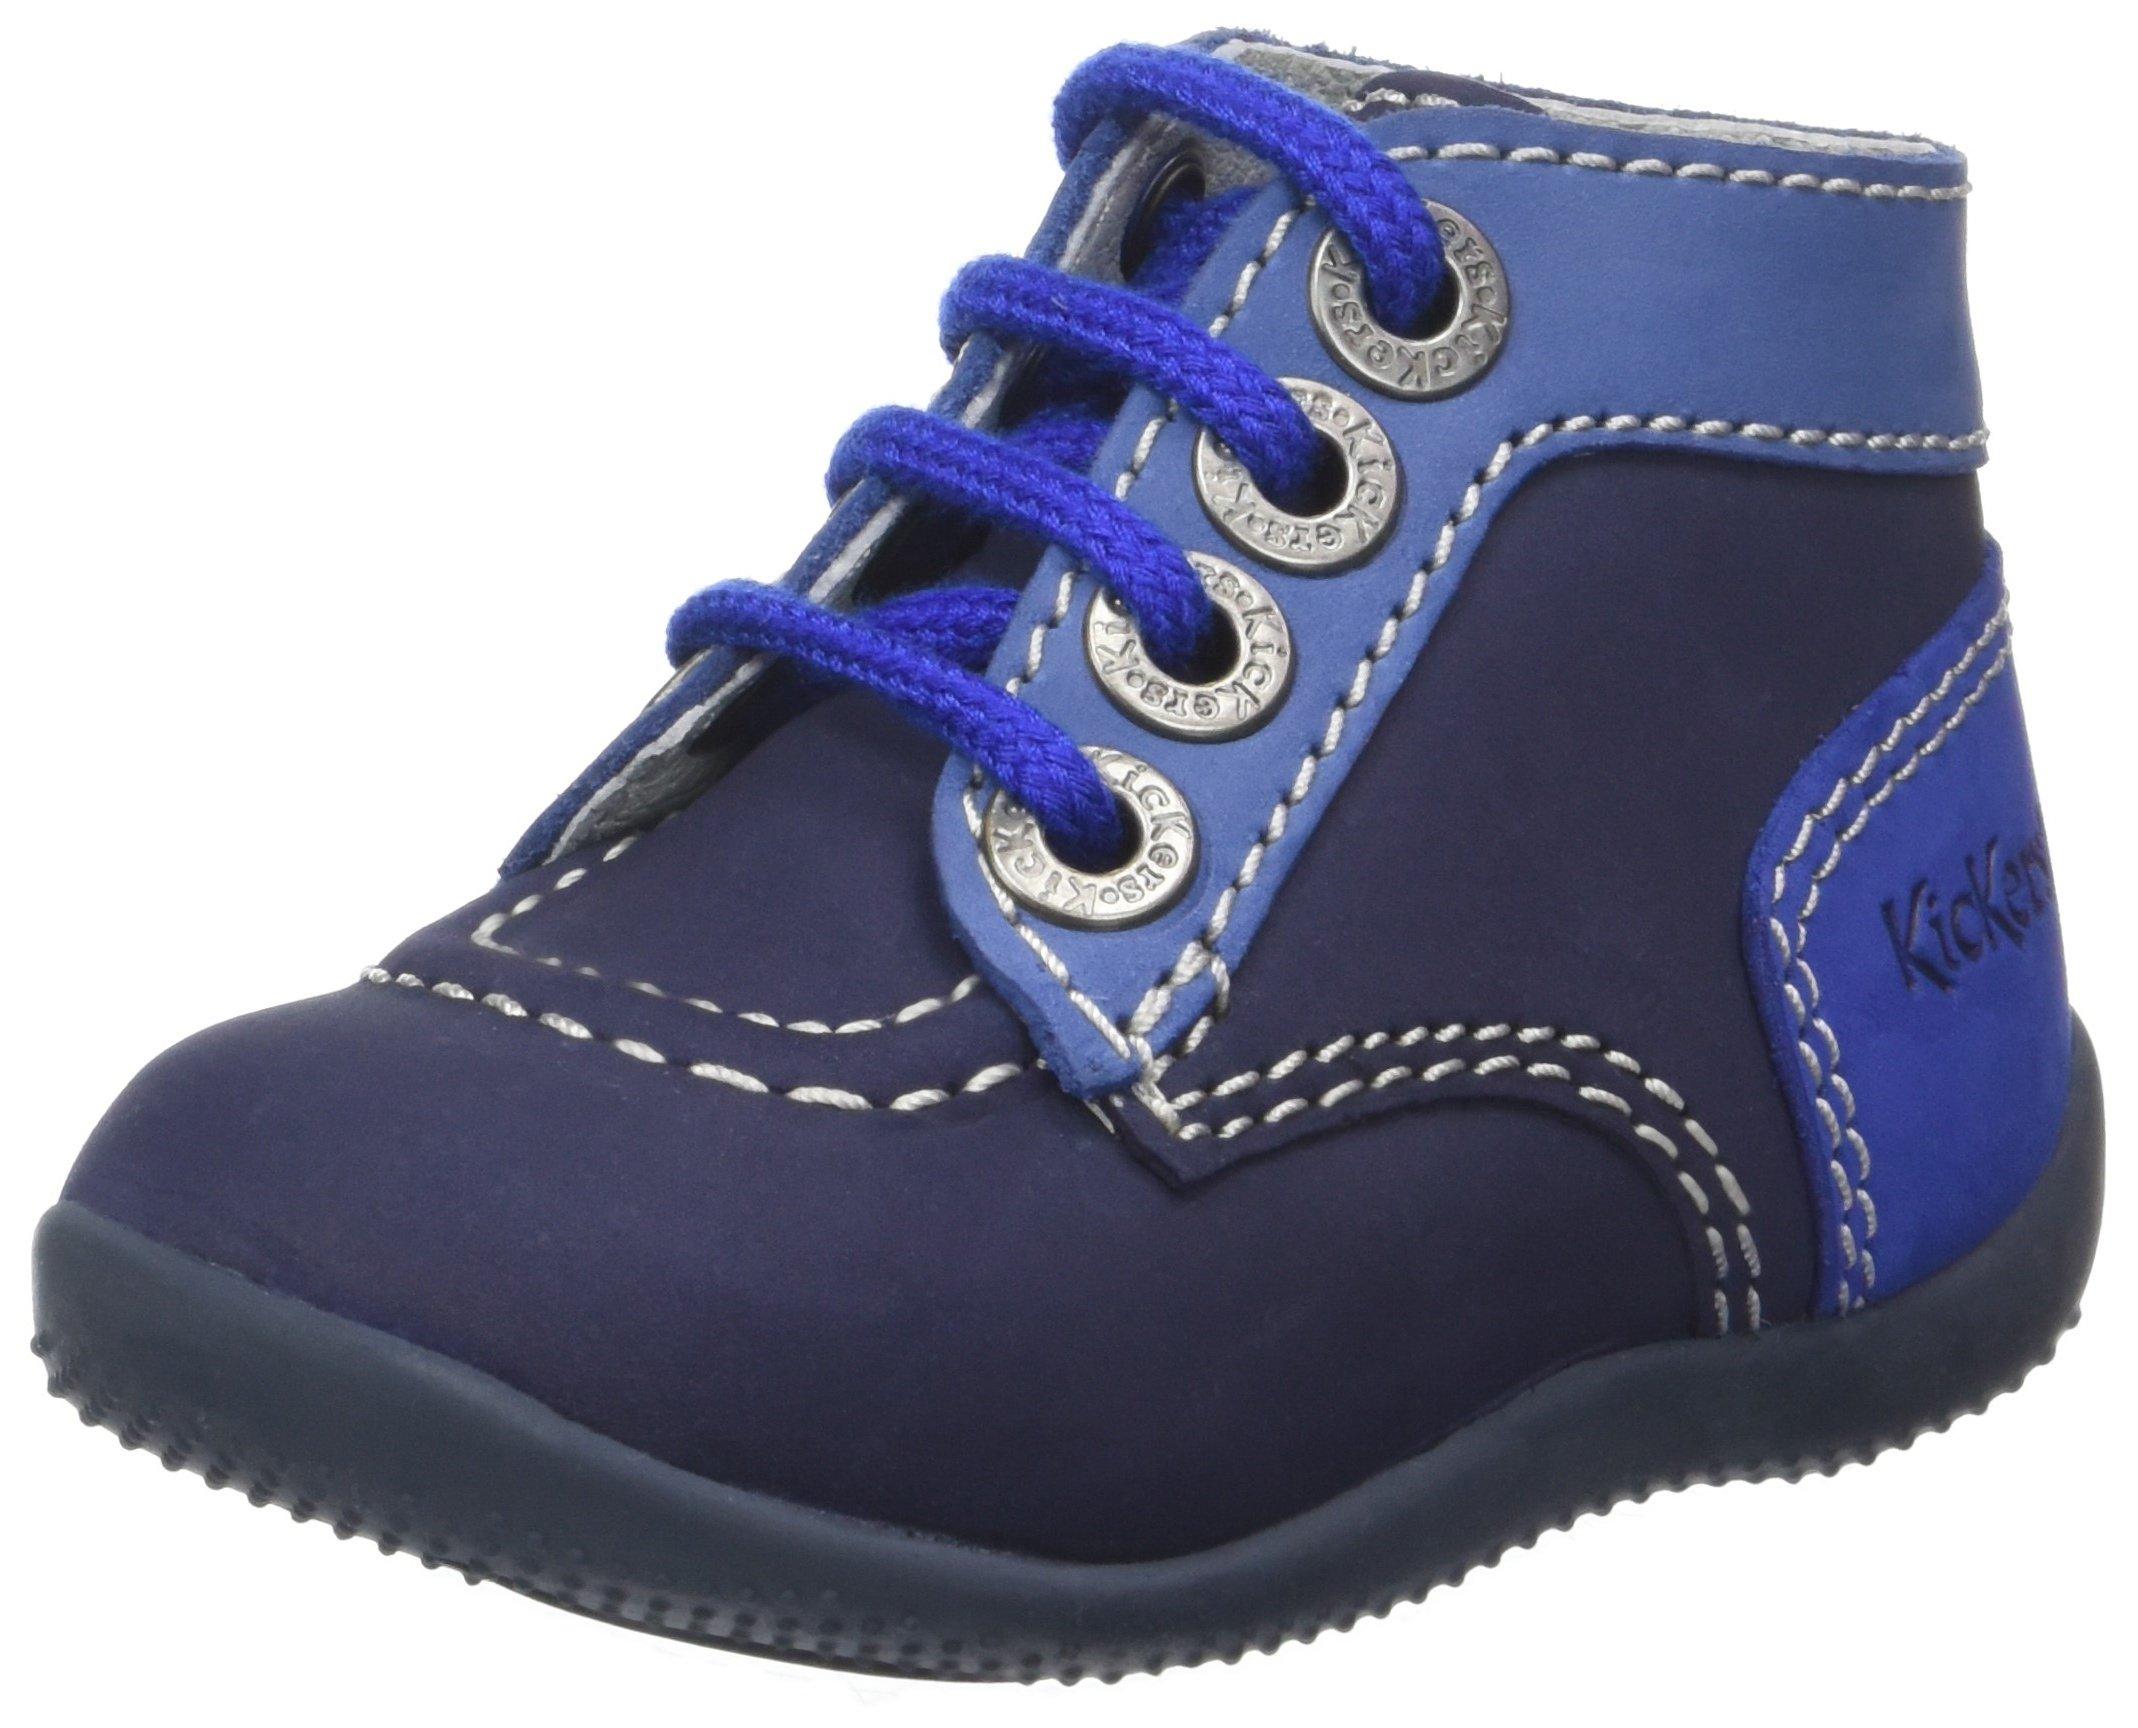 5011b64dda709 Top Chaussures bébé garçon selon les notes Amazon.fr